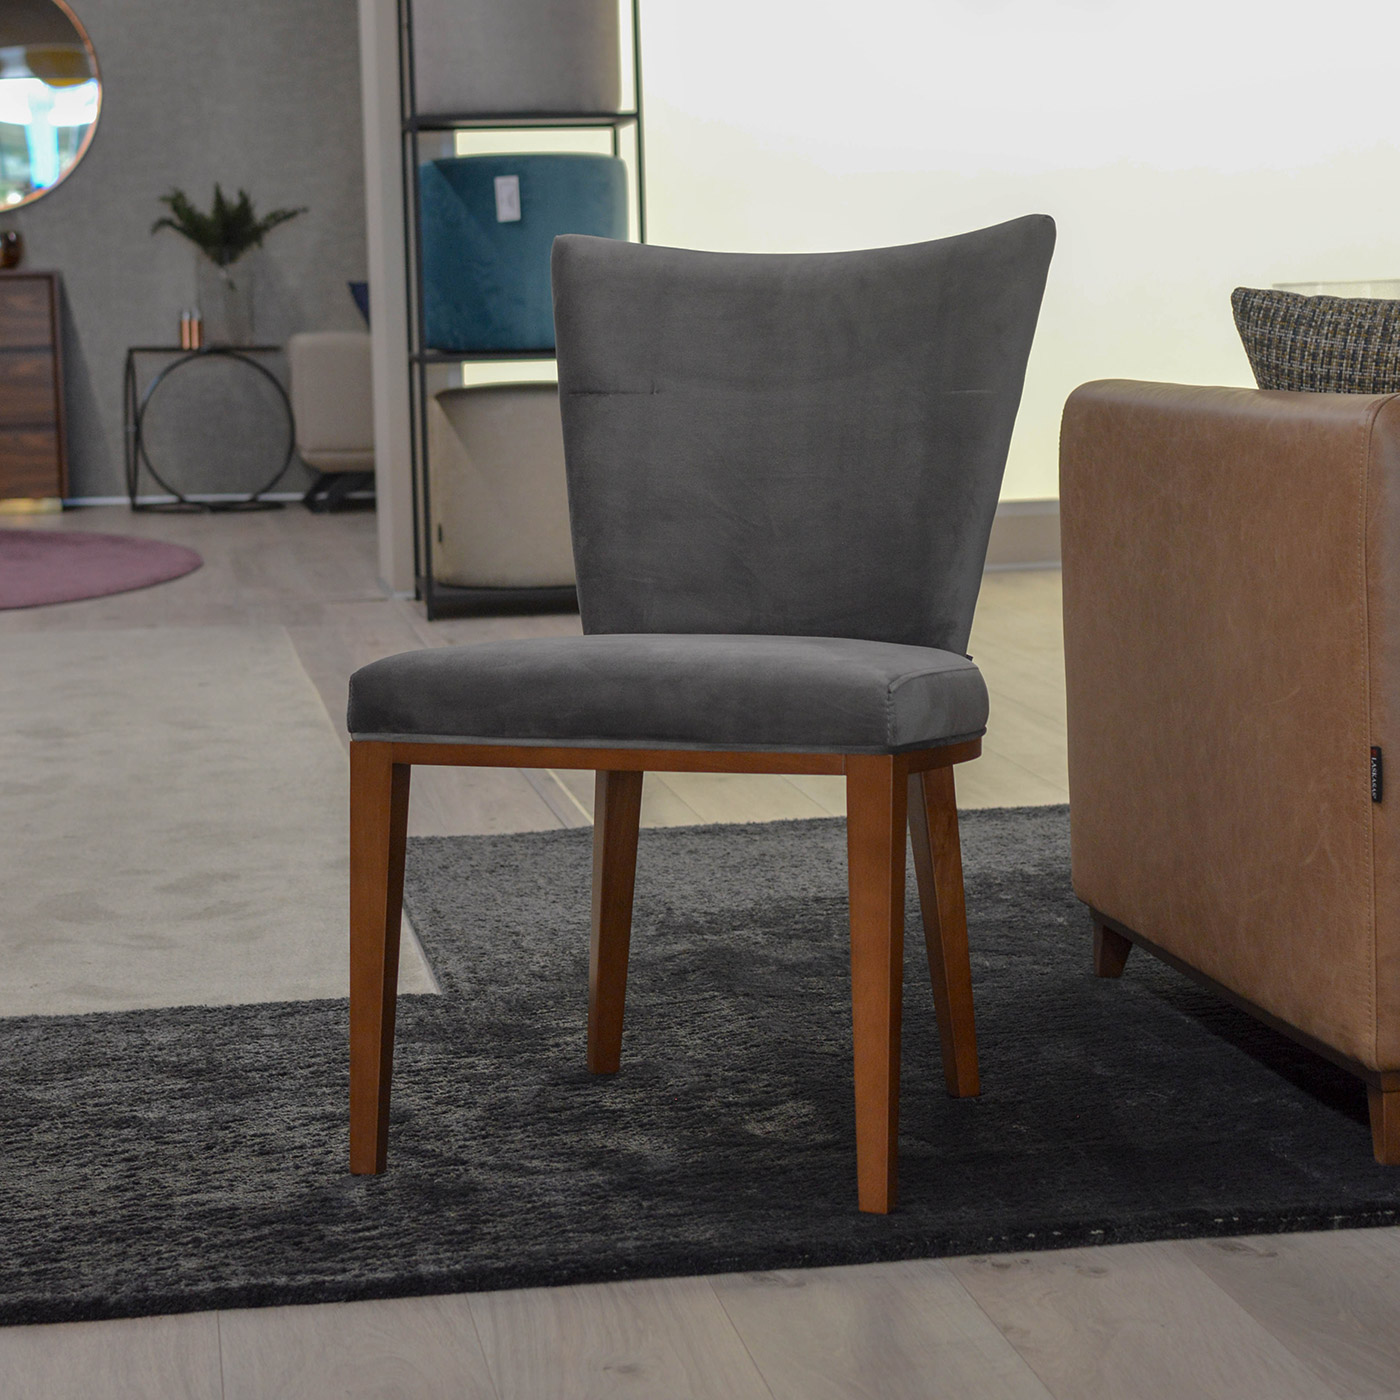 cadeira-vianna-domkapa-promoçoes-escaldantes